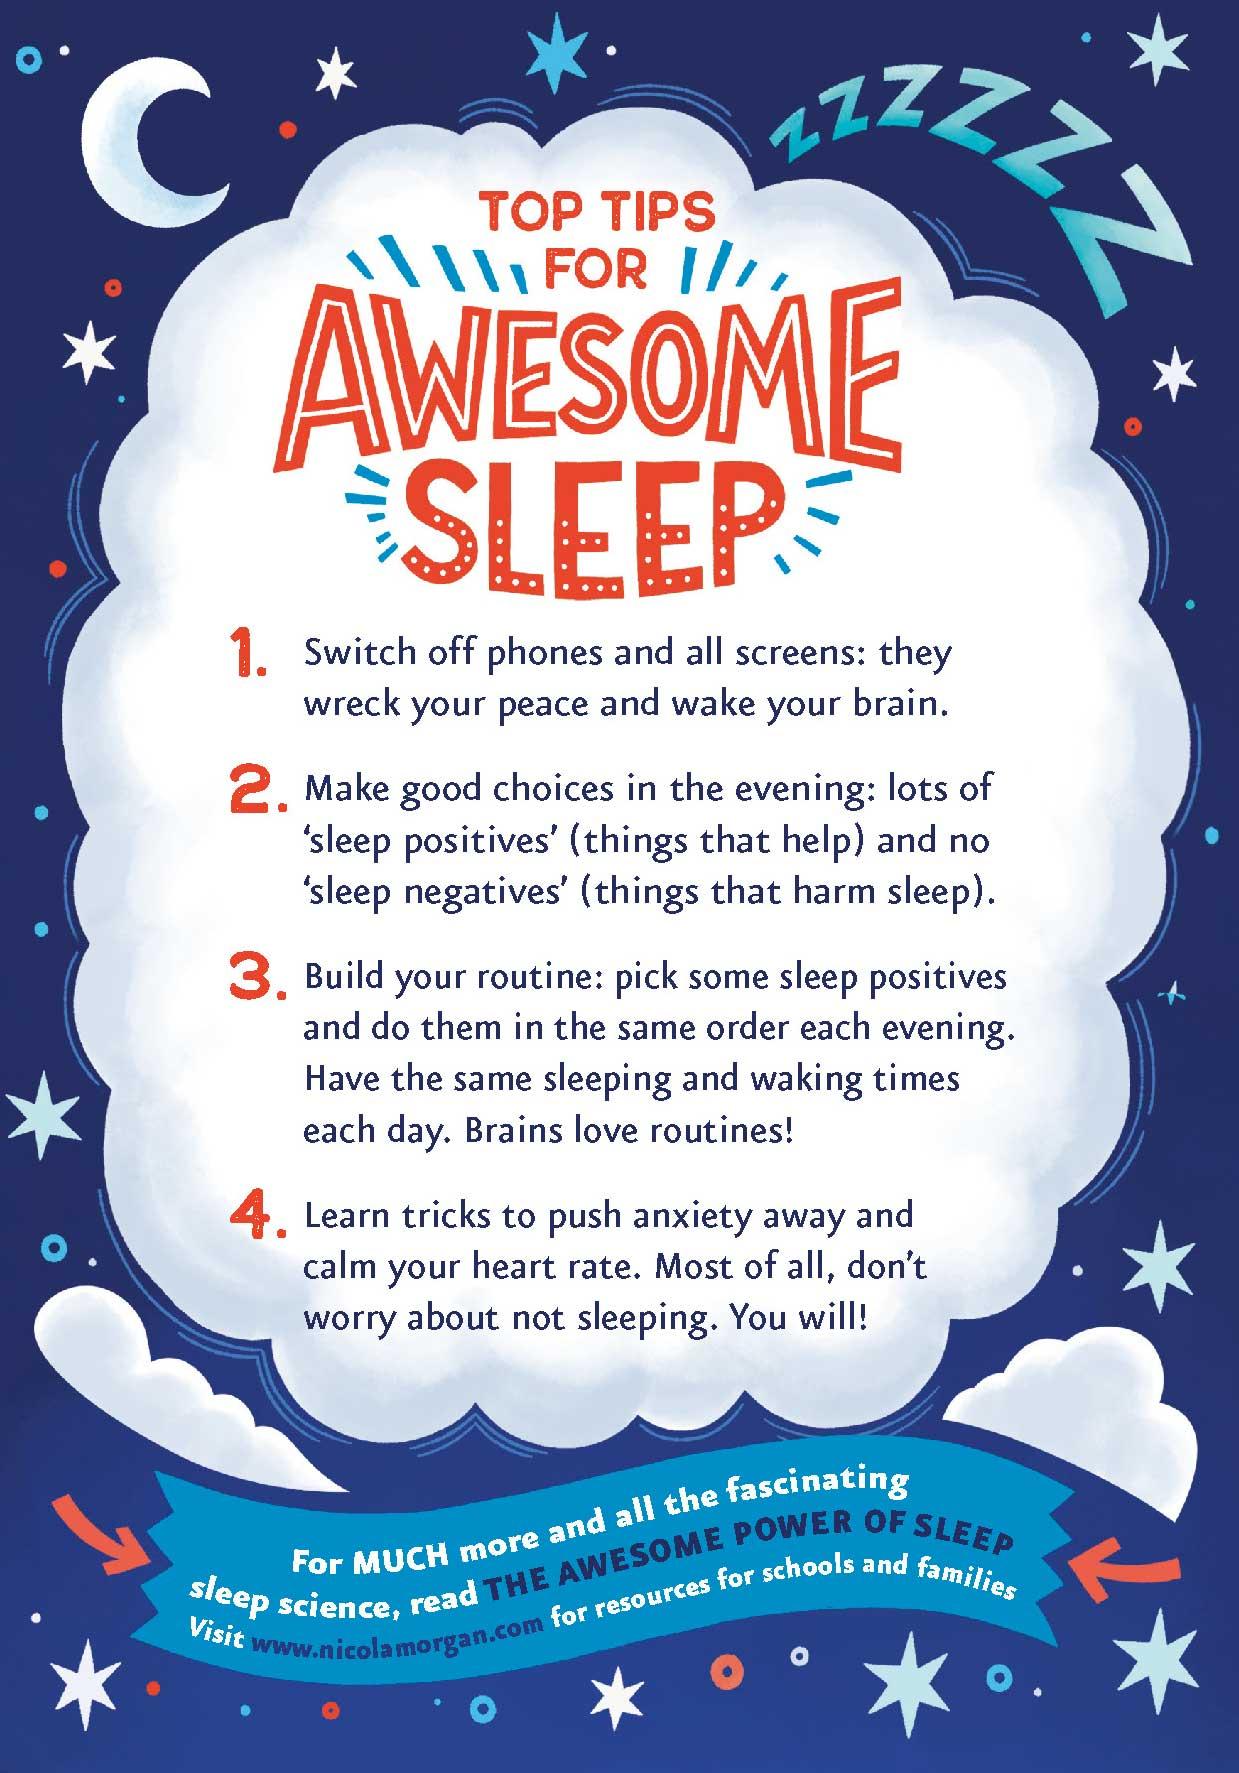 The Awesome Power of Sleep postcard